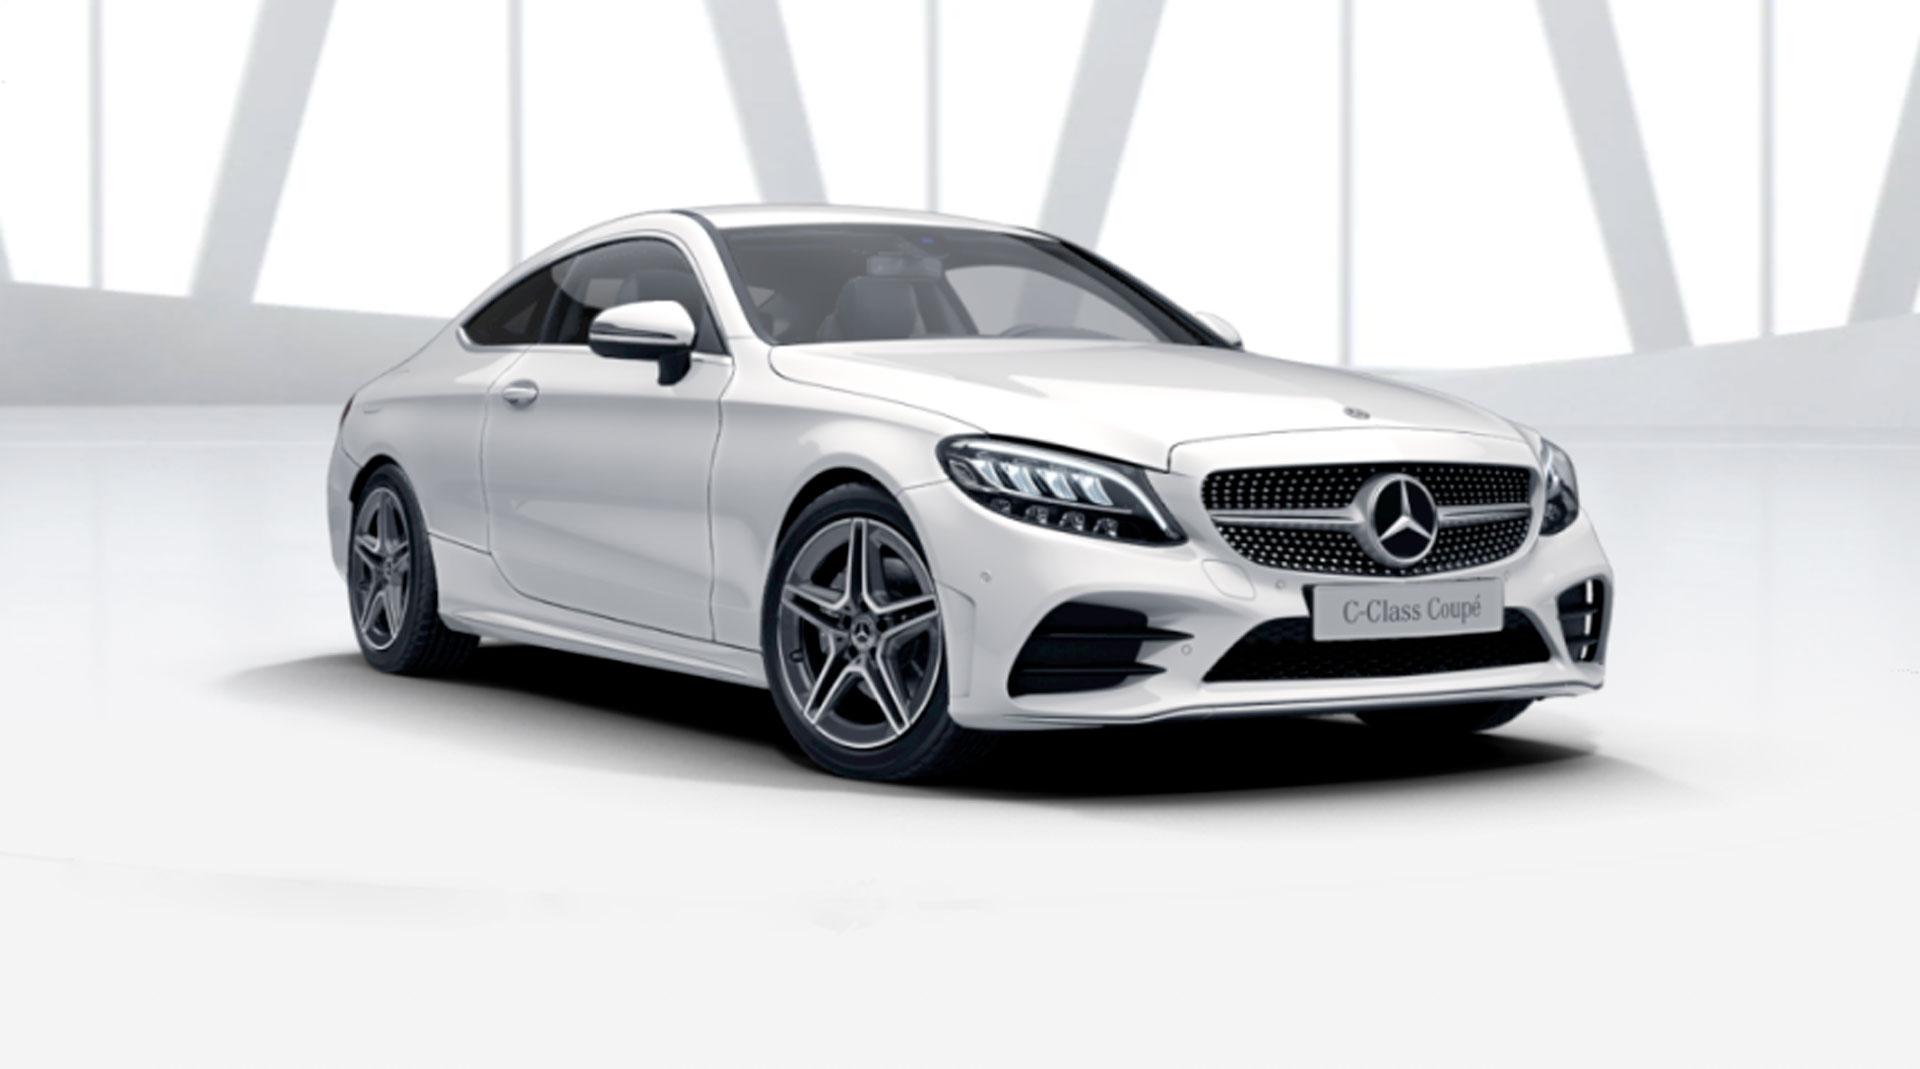 Mercedes-Benz C-Class Coupe 0152605069